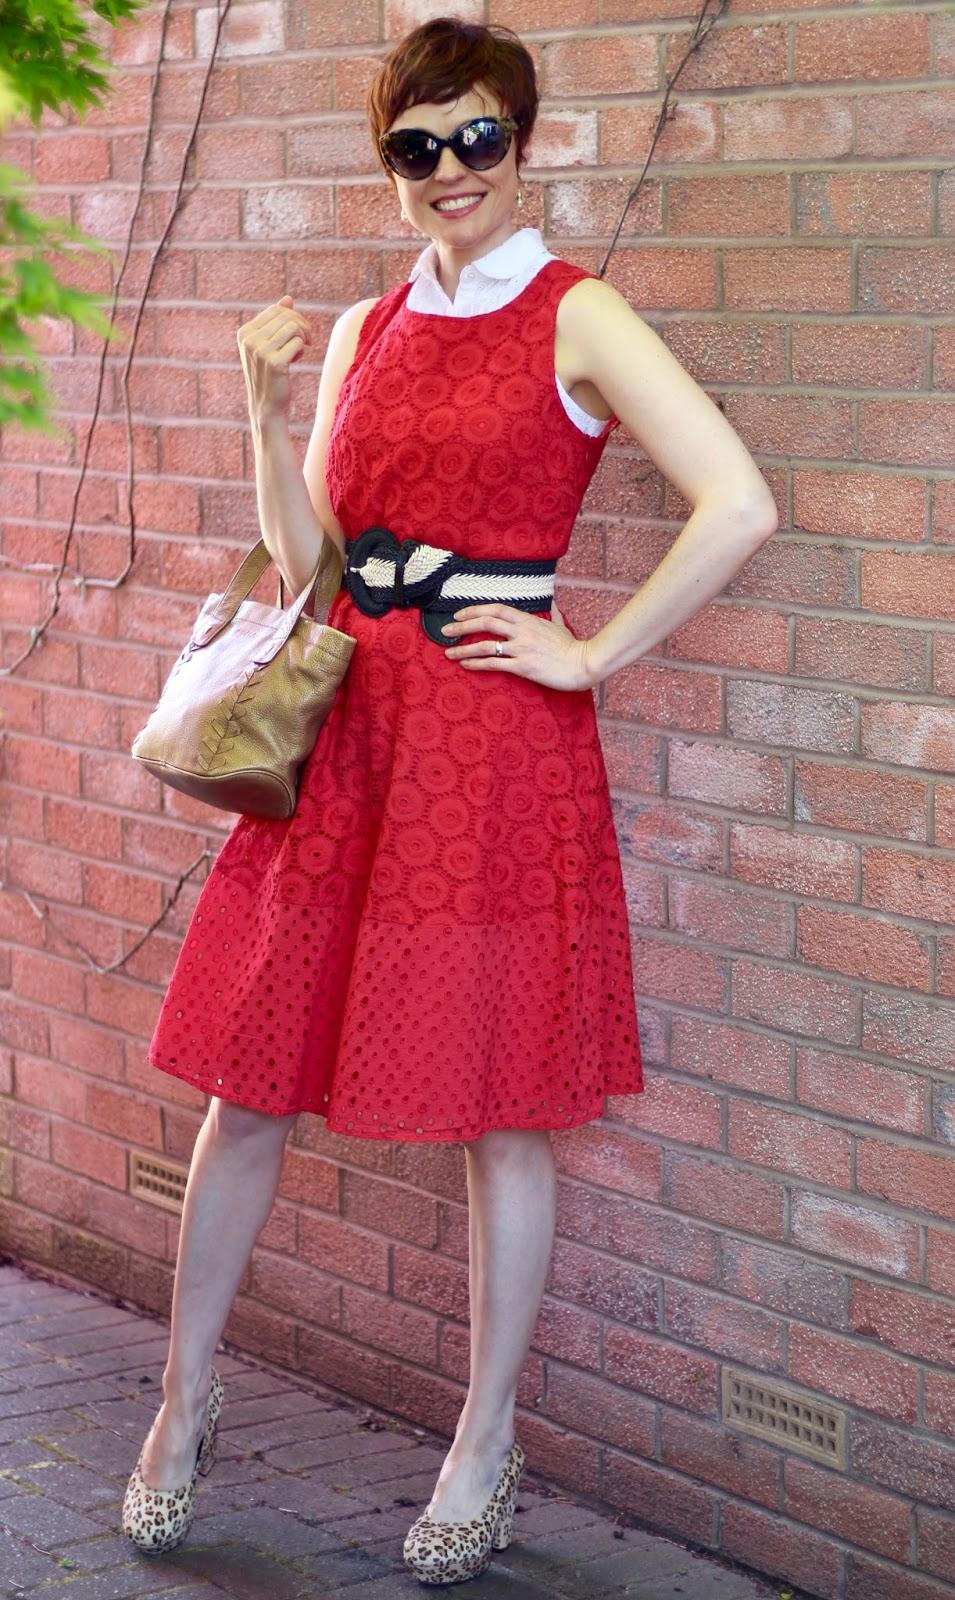 White sleeveless shirt under a red dress, leopard platform shoes & Black& white belt | Over 40